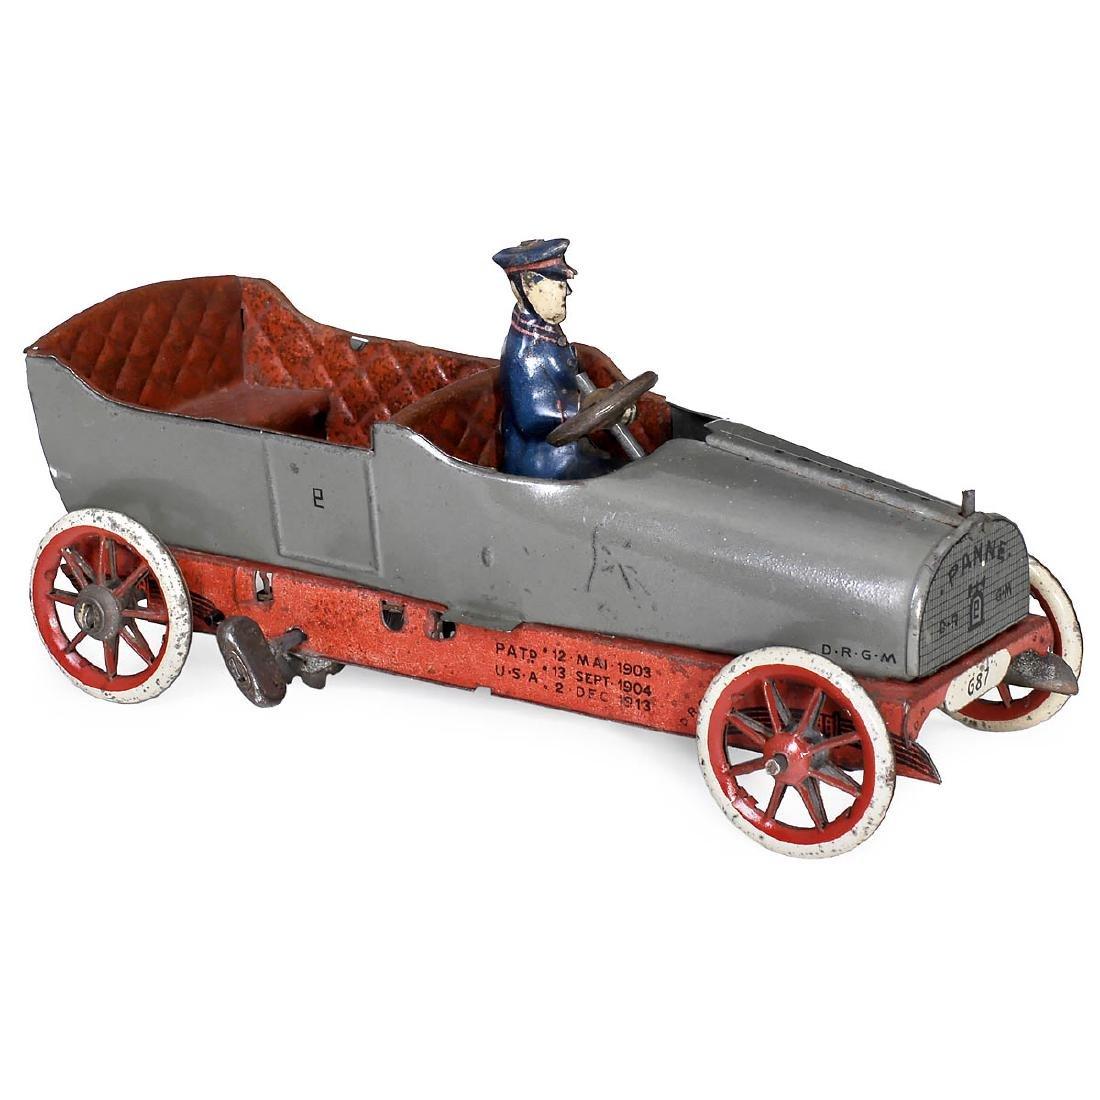 "Lehmann EPL 687 ""Panne"" Touring Car, 1914 onwards"